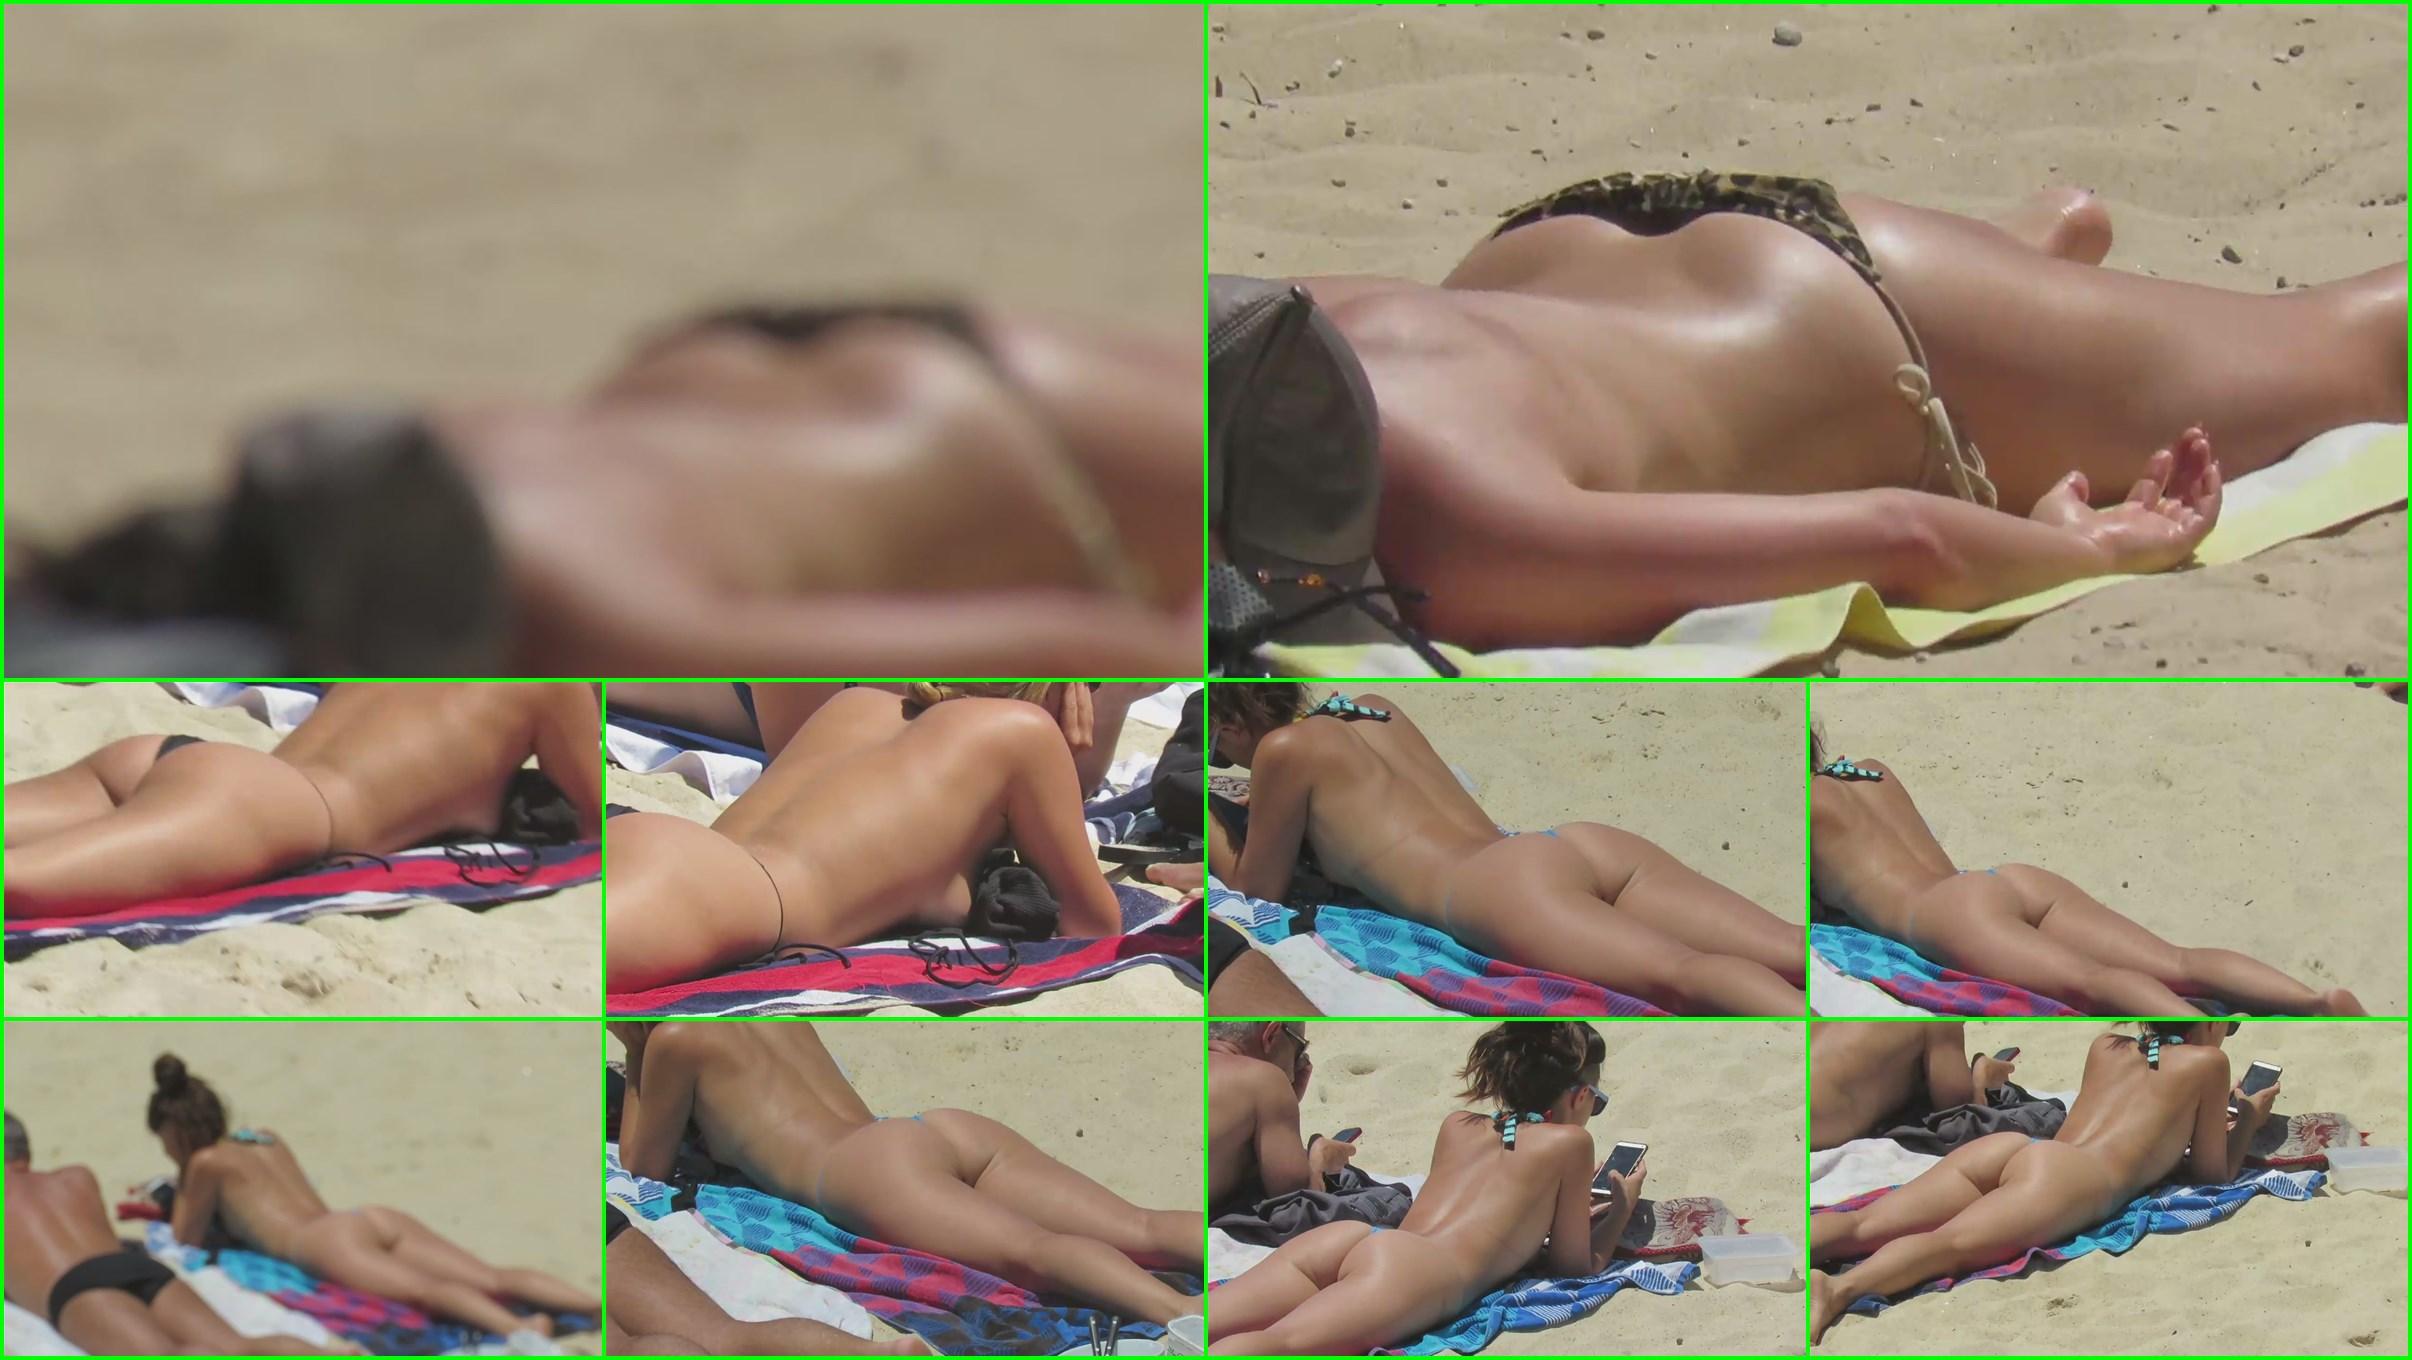 Voyeur_Amazing_topless_girls_at_beach_thumb.jpg